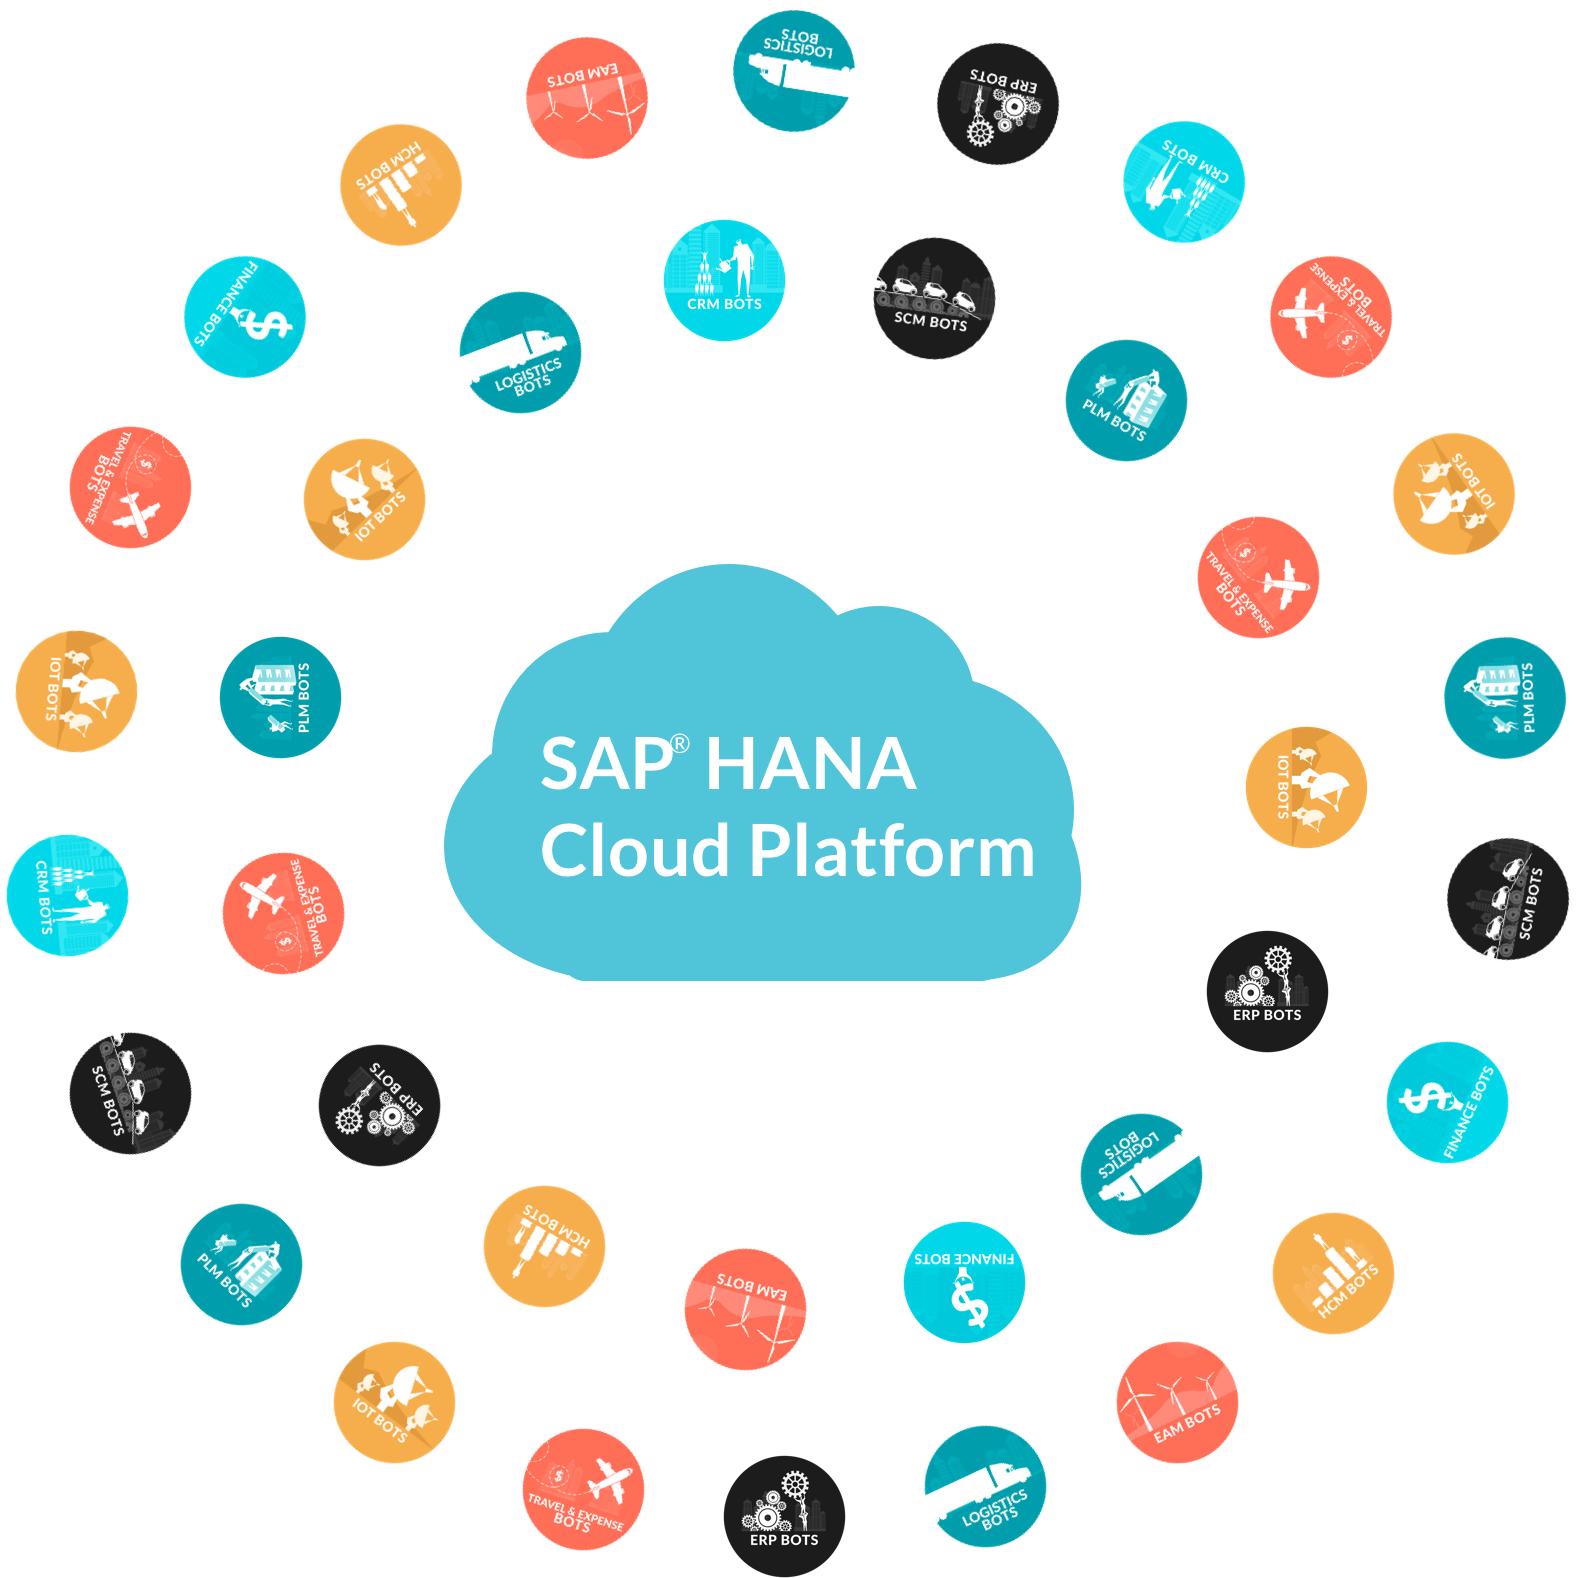 SAP HANA Cloud Platform Chatbots